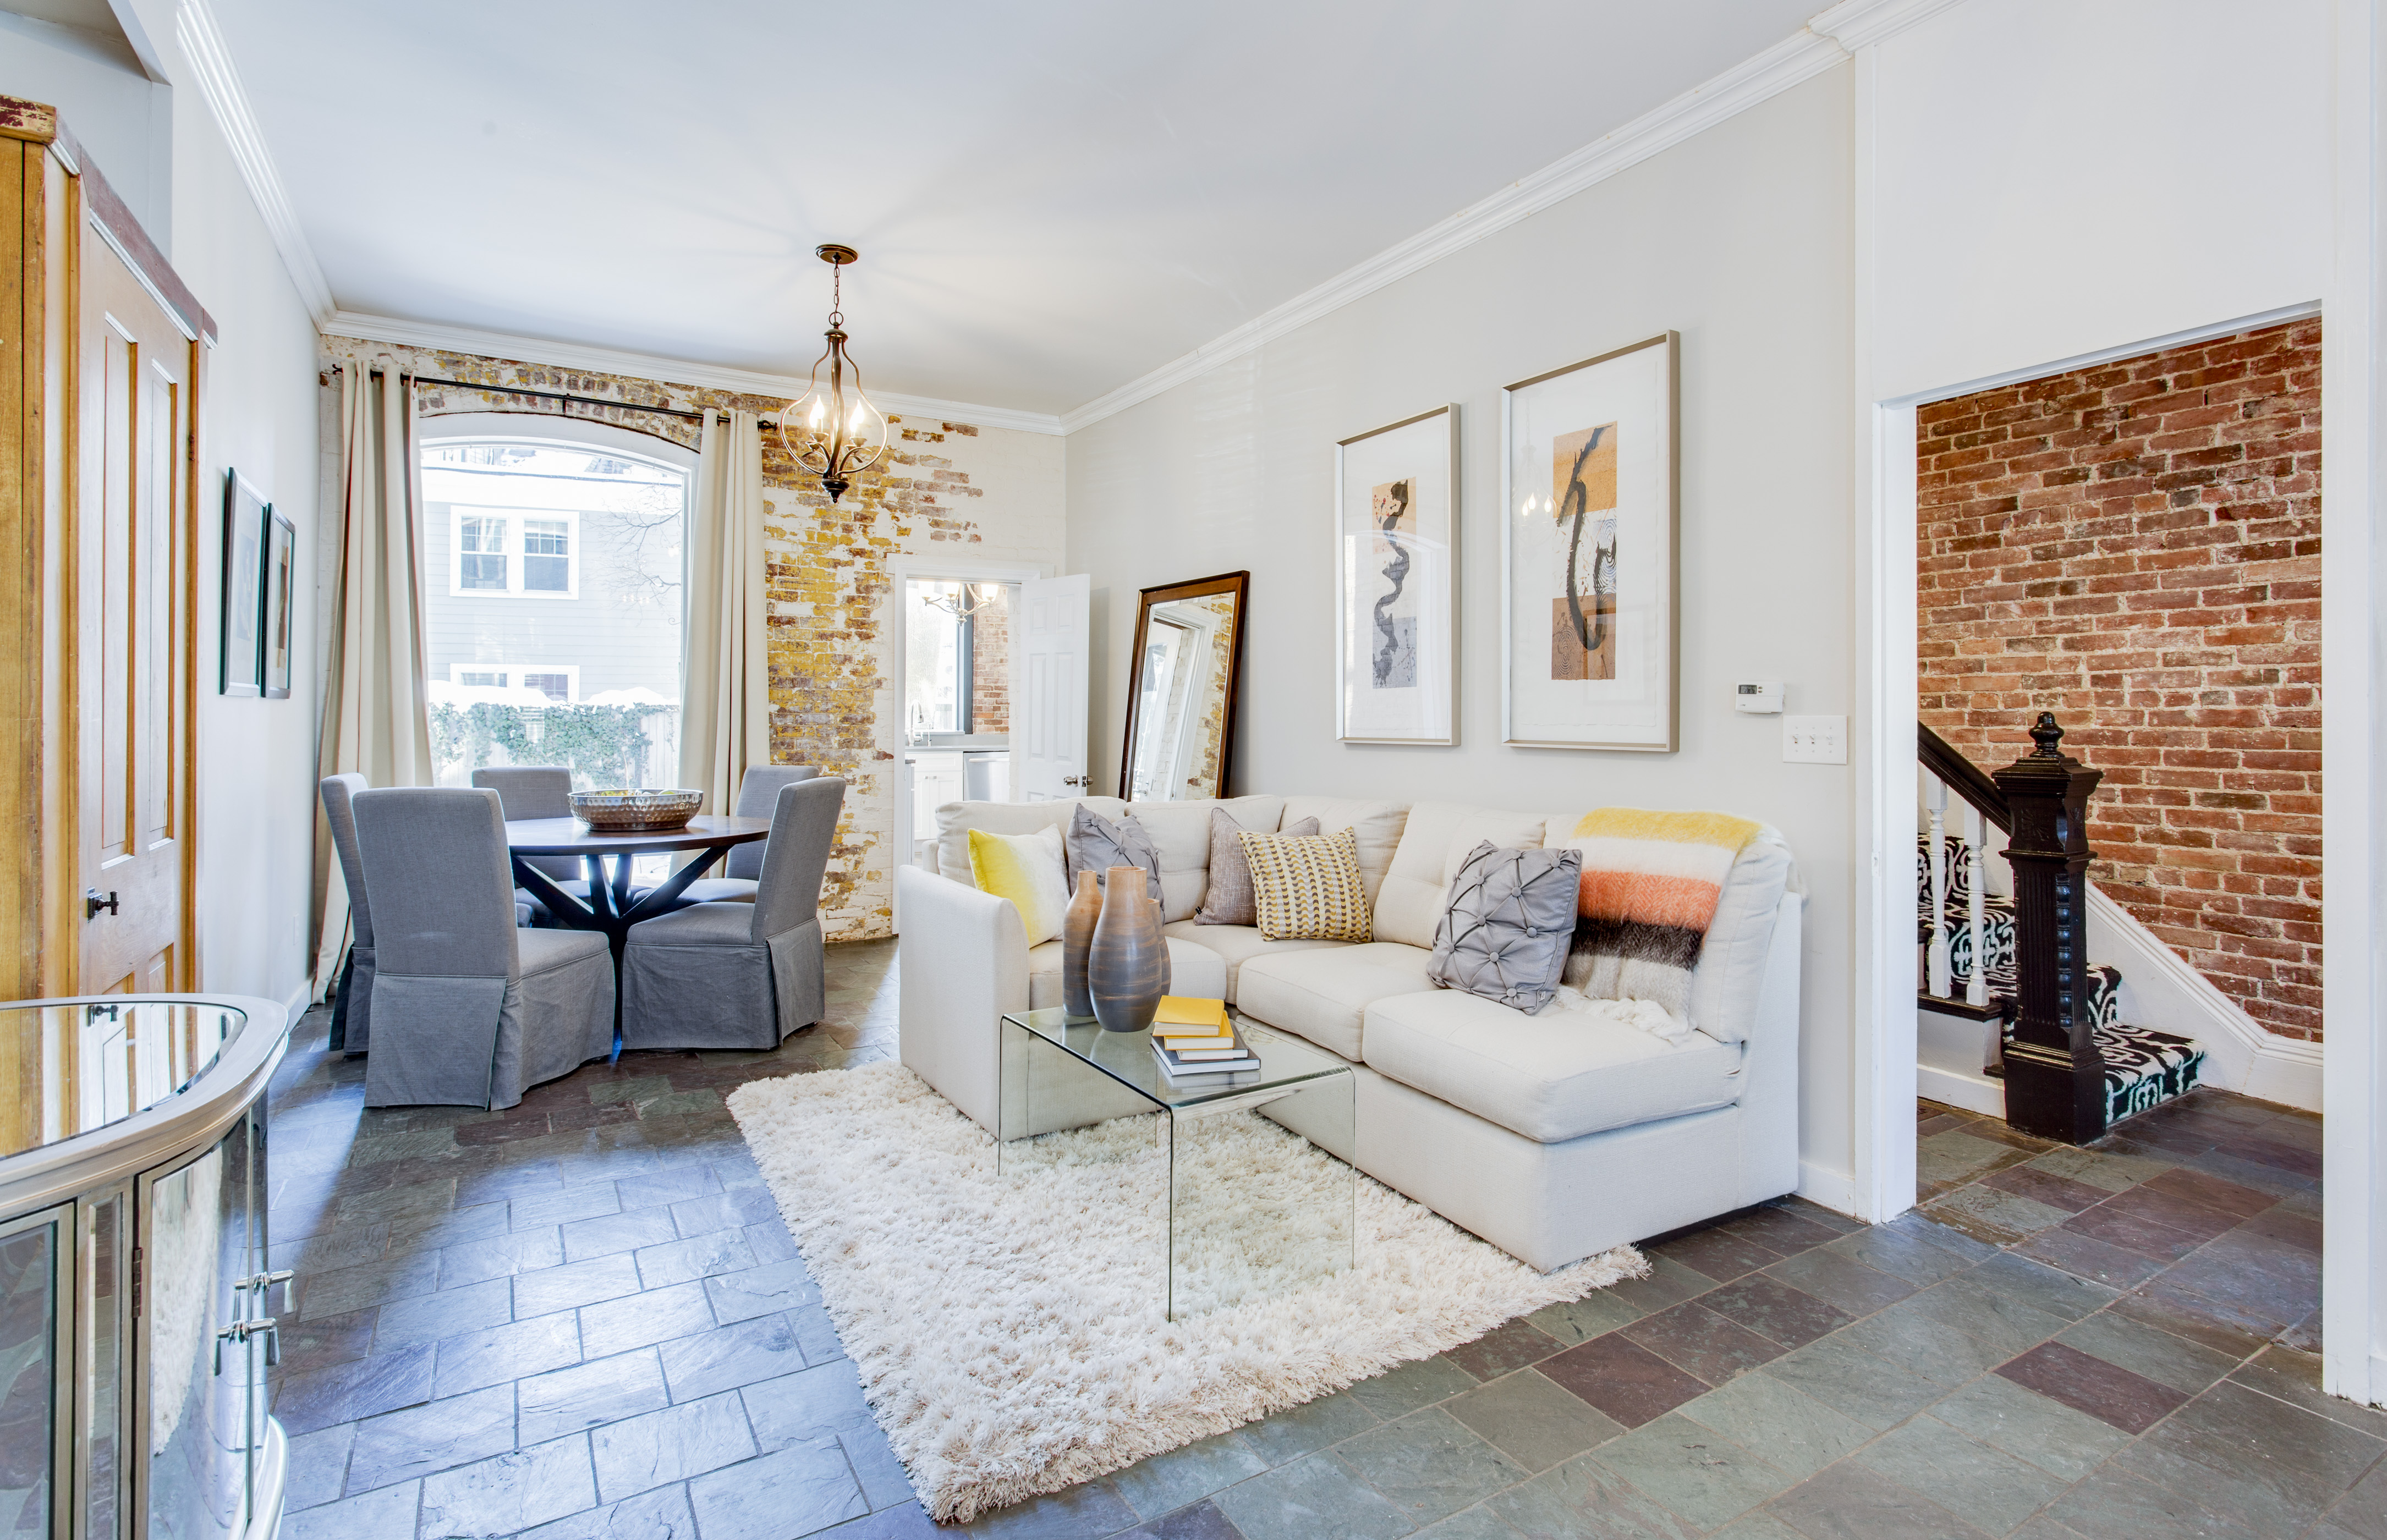 sales property at 52 Kirkland Street Singe-Family Home in Harvard Square